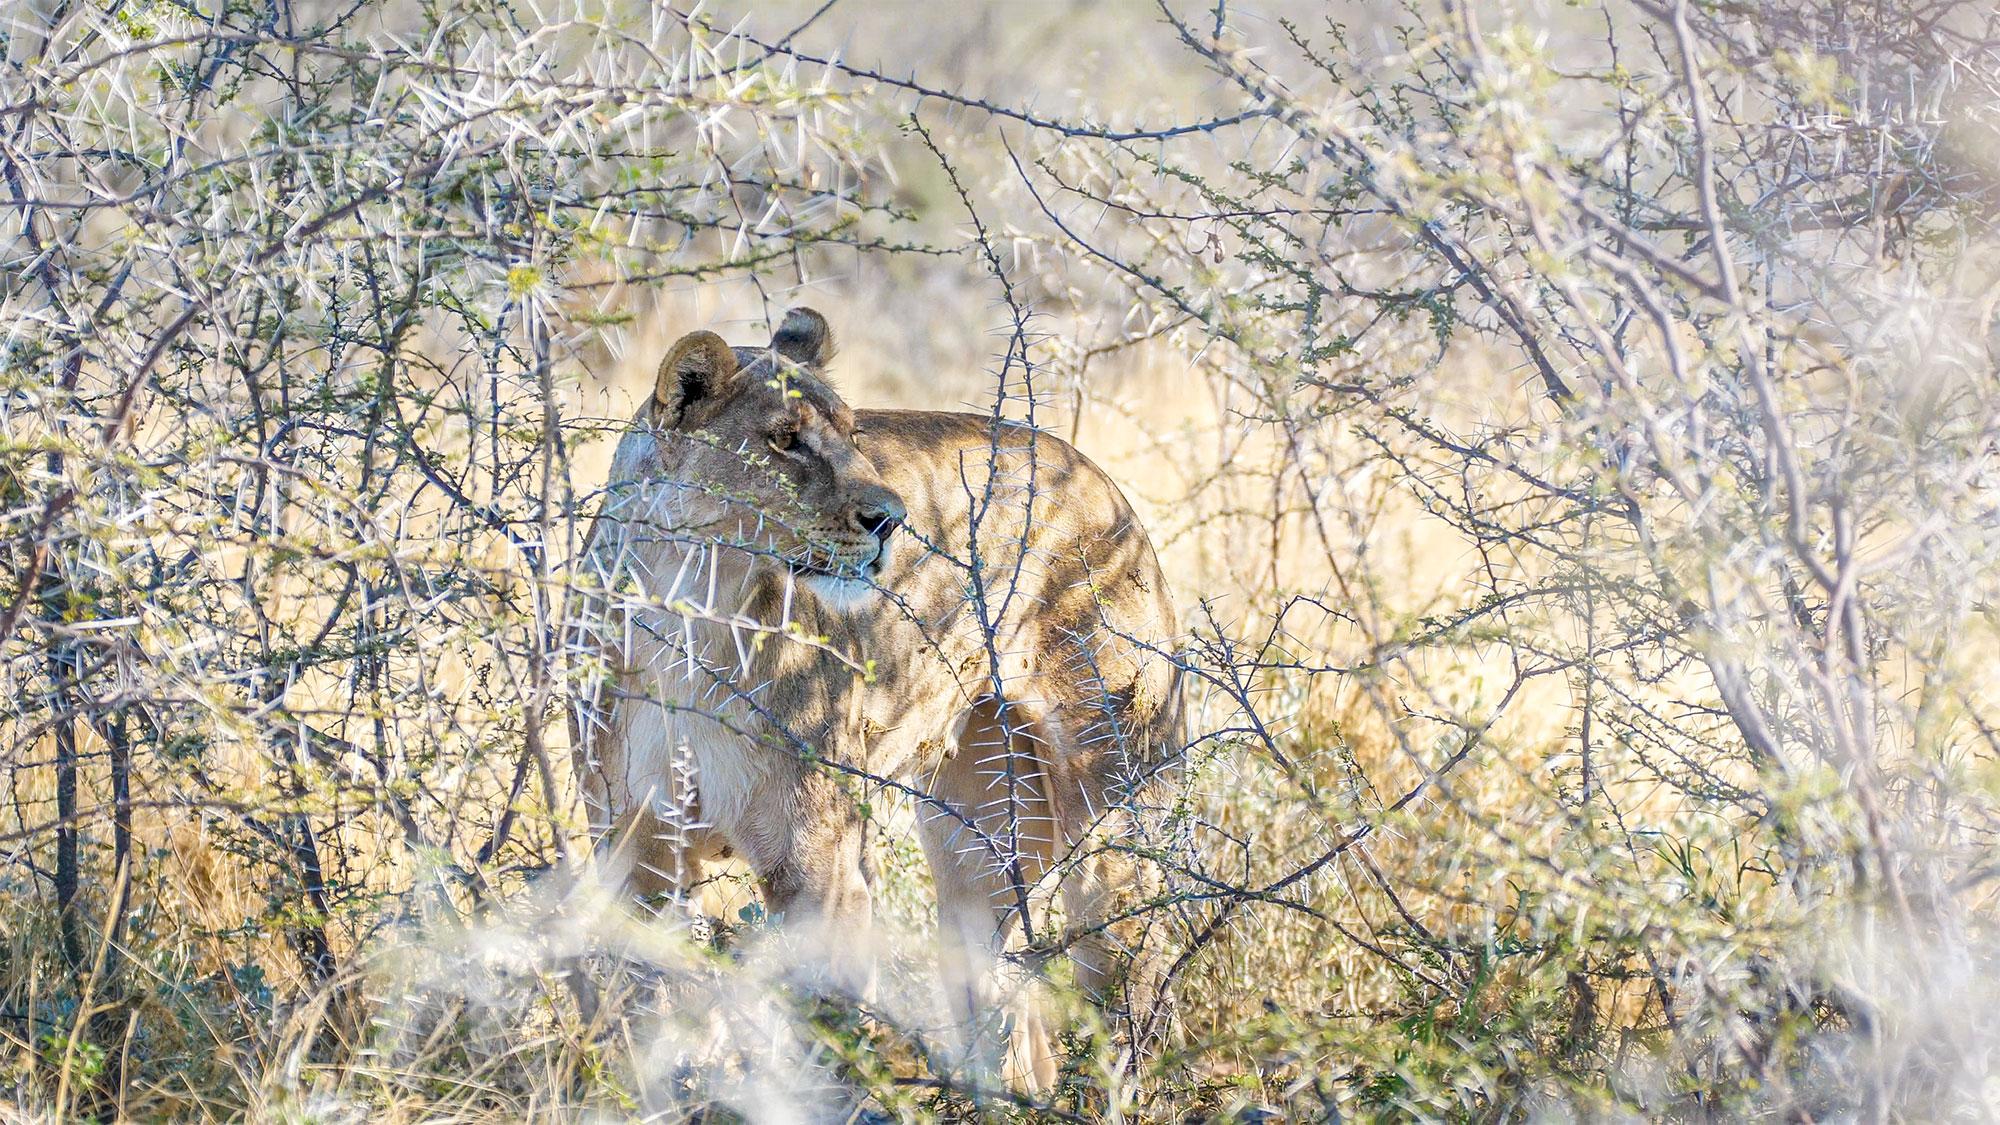 lioness on safari in Etosha National Park, Namibia, Africa